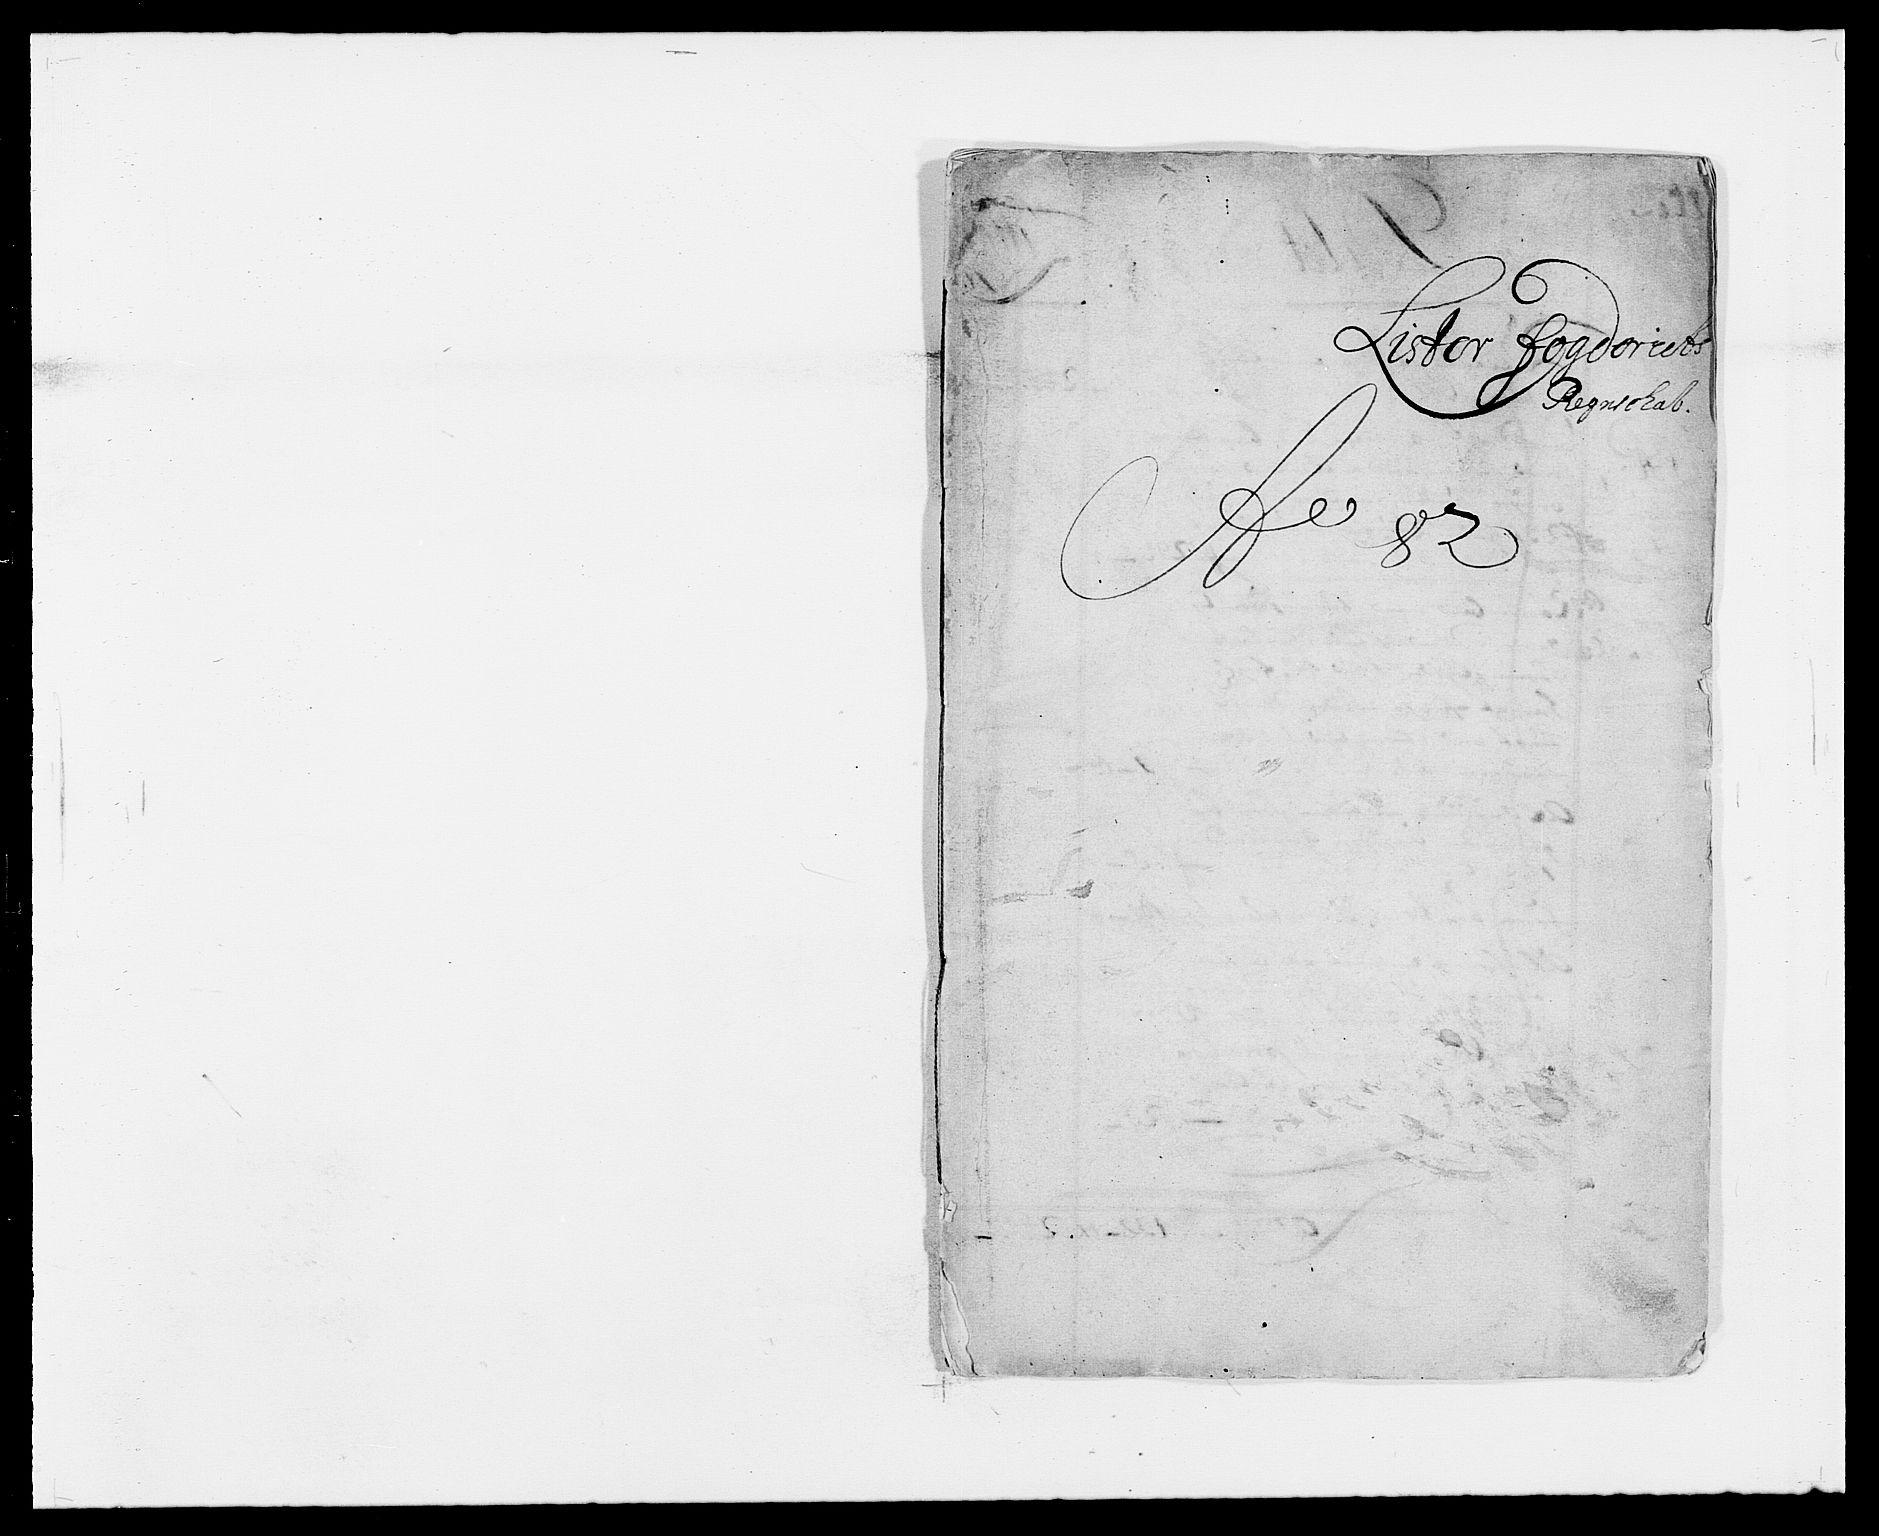 RA, Rentekammeret inntil 1814, Reviderte regnskaper, Fogderegnskap, R41/L2531: Fogderegnskap Lista, 1680-1682, s. 164